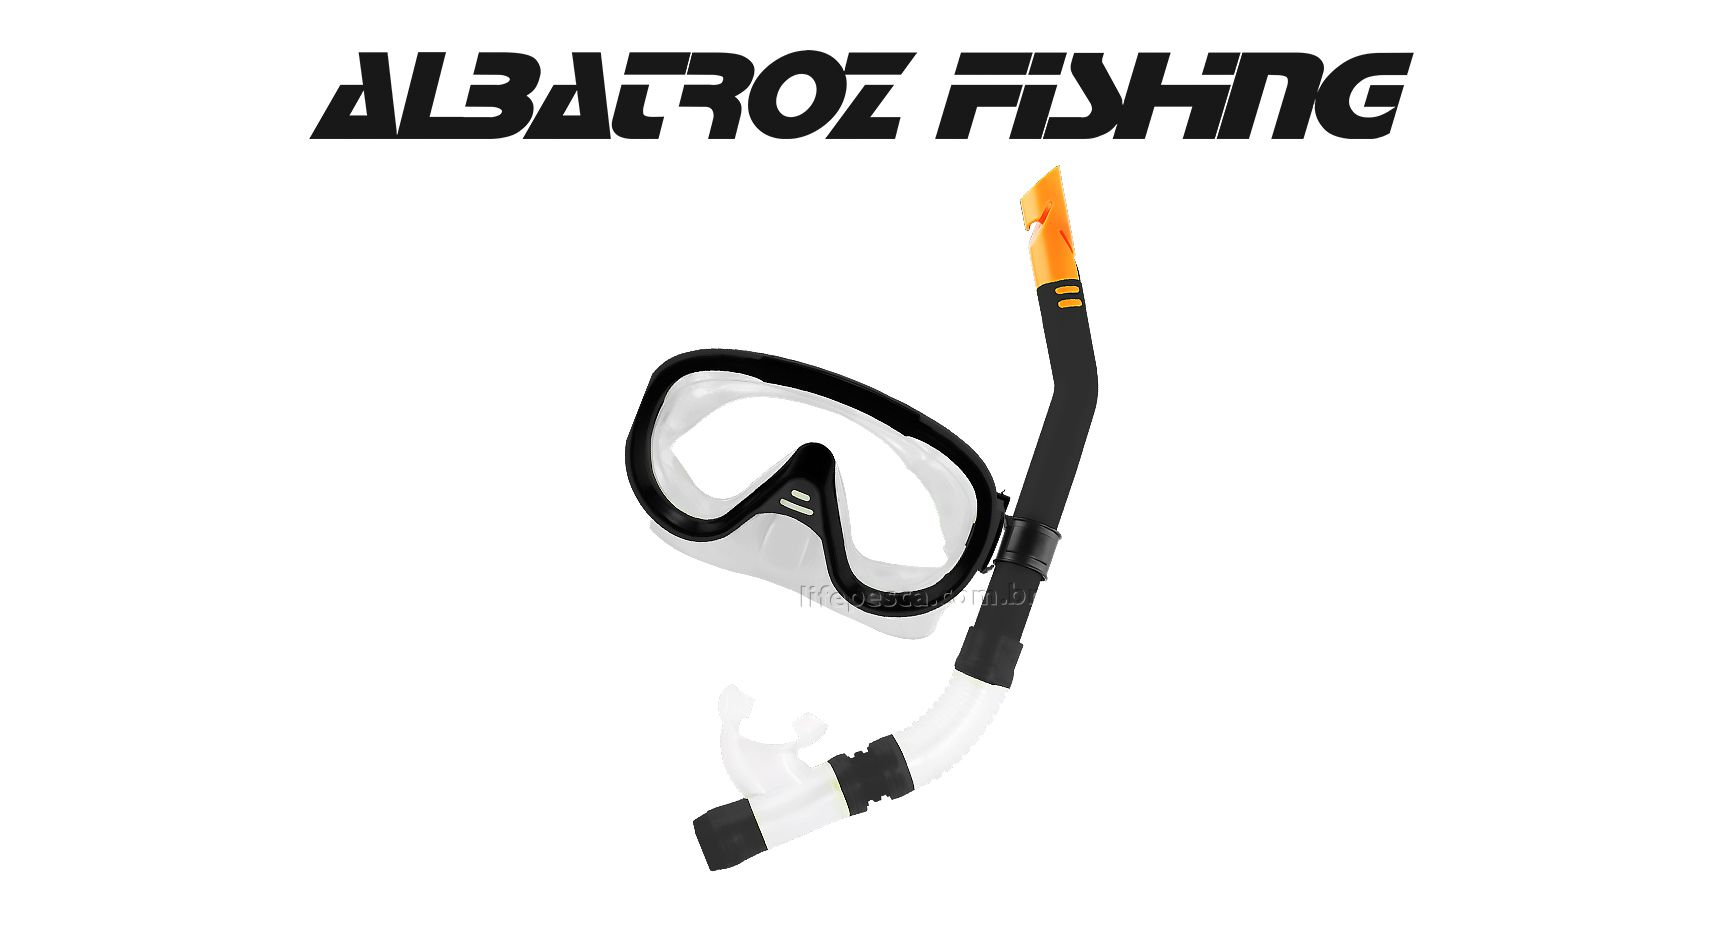 Kit Mergulho Snorkel Play - Albatroz Fishing - Várias Cores